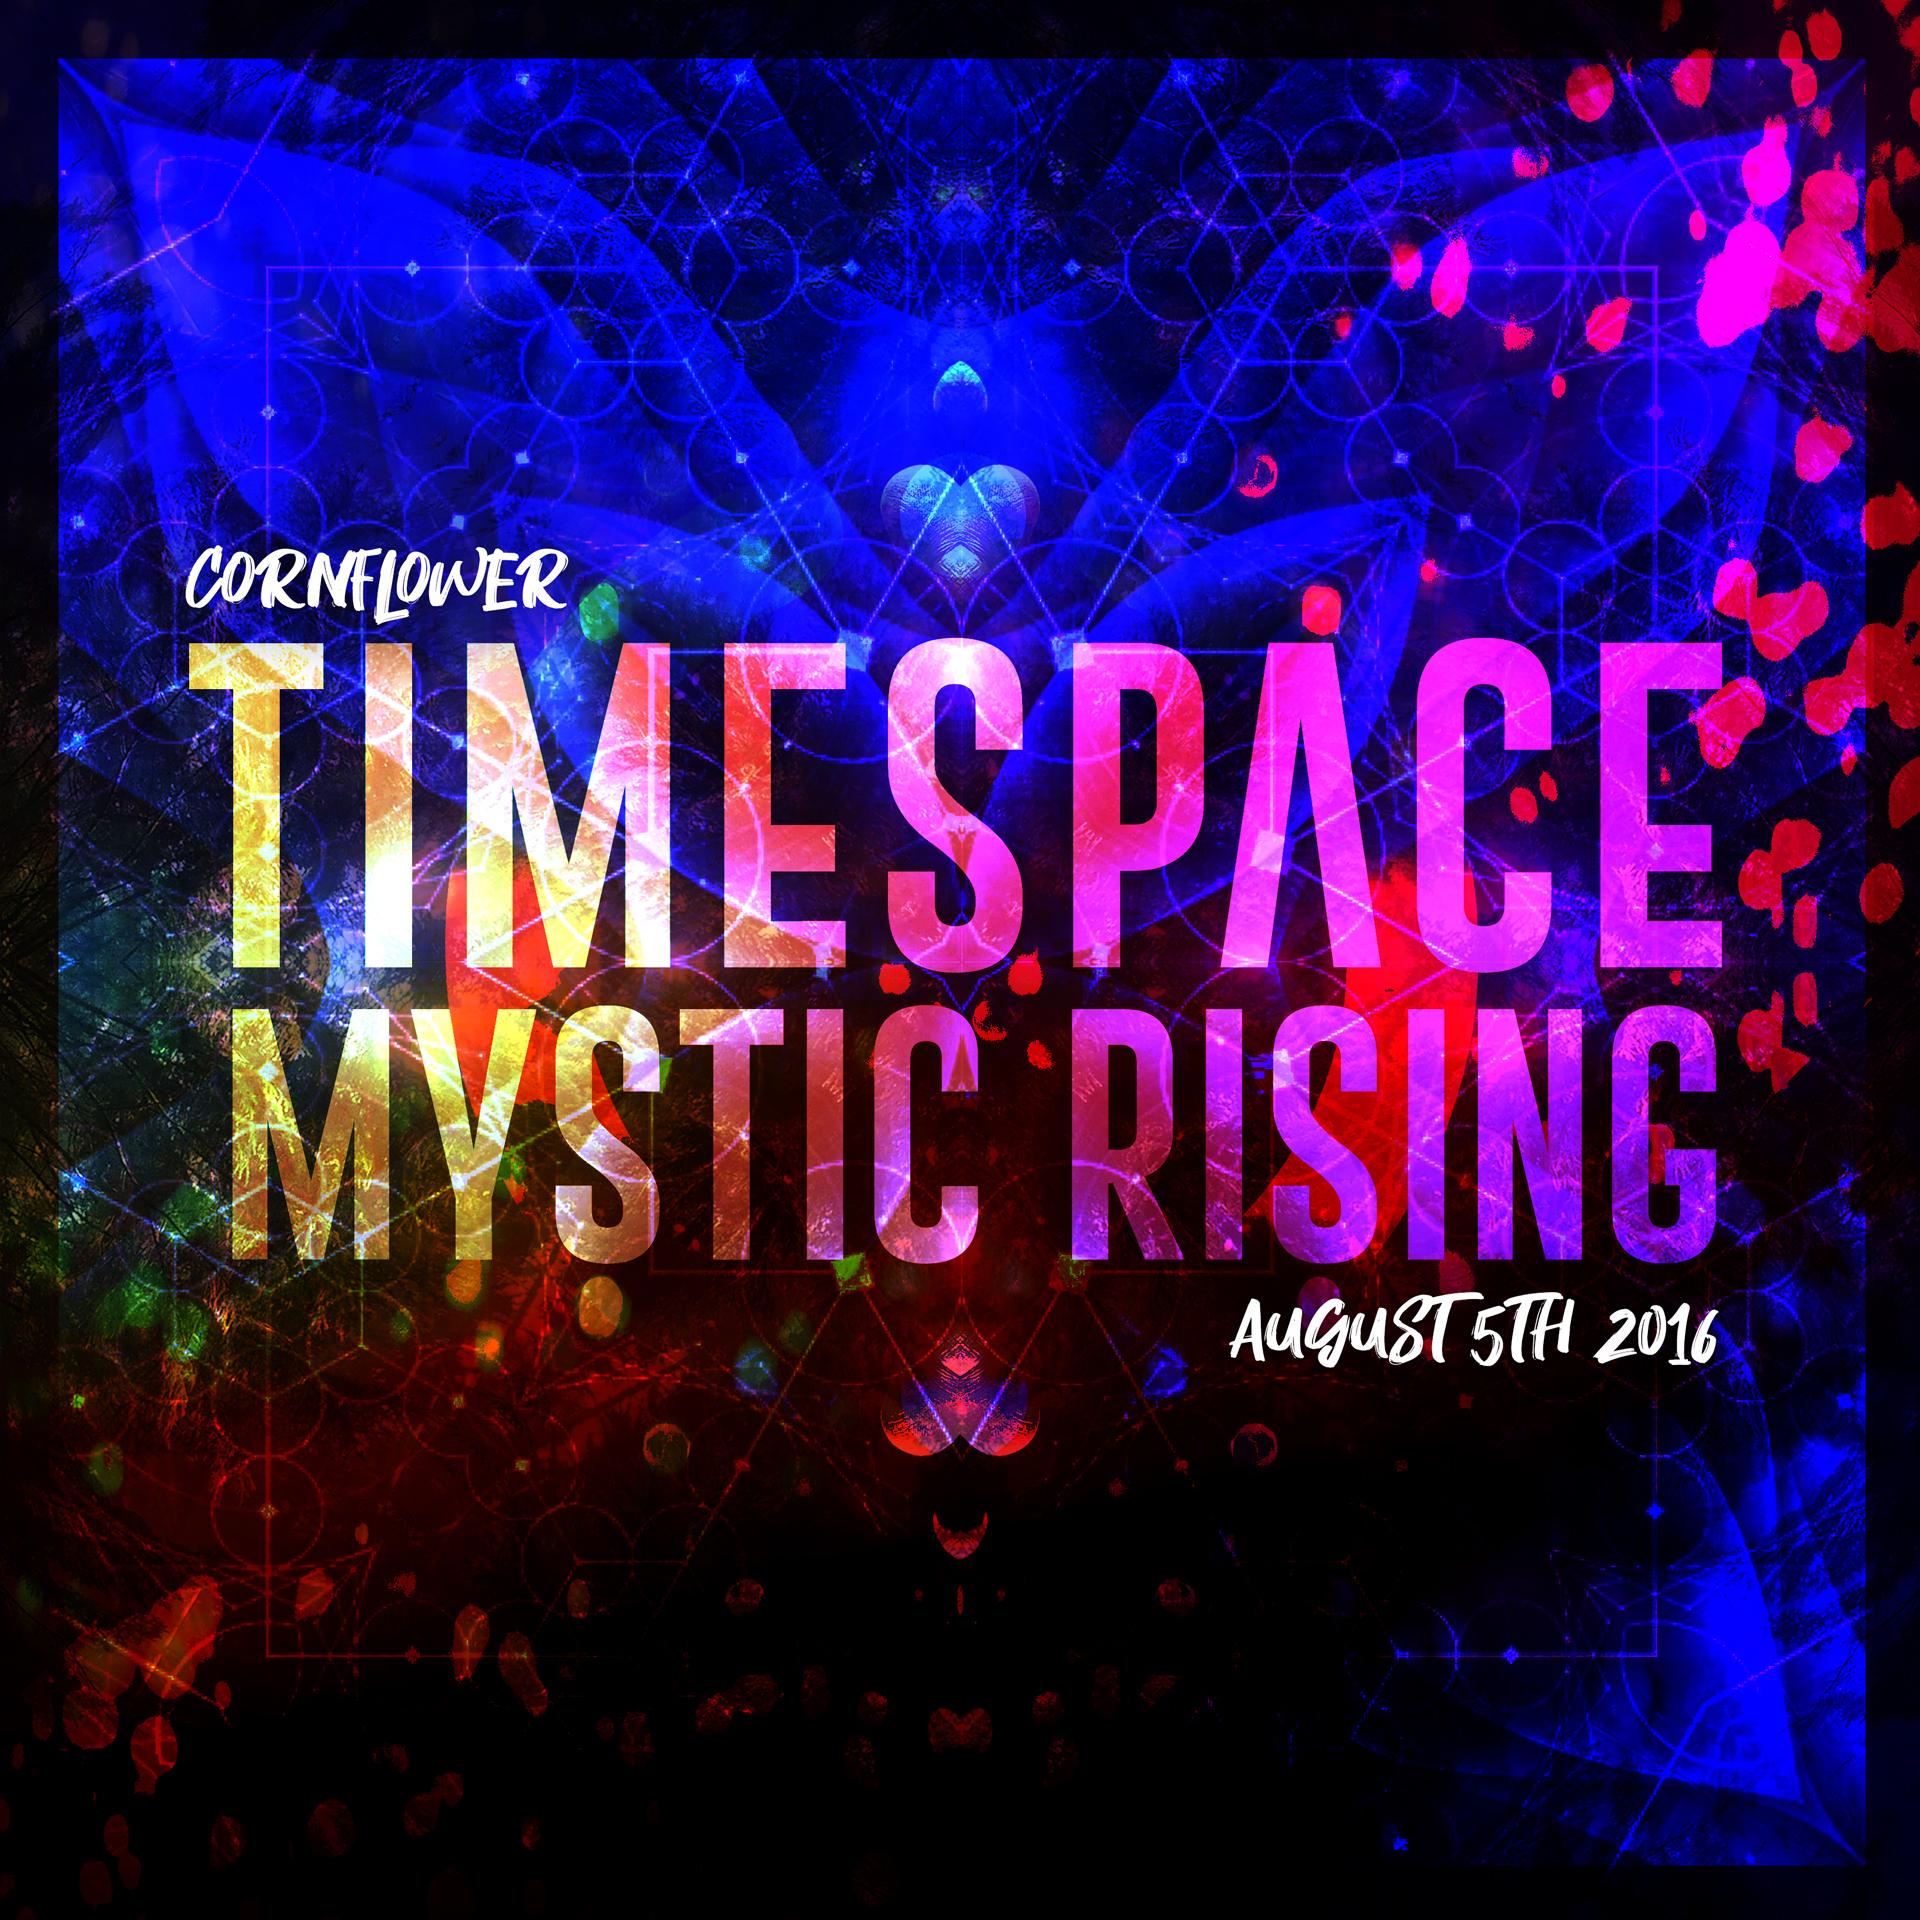 img-TimeSpaceMysticRising-CoverArtwork-edit.jpg